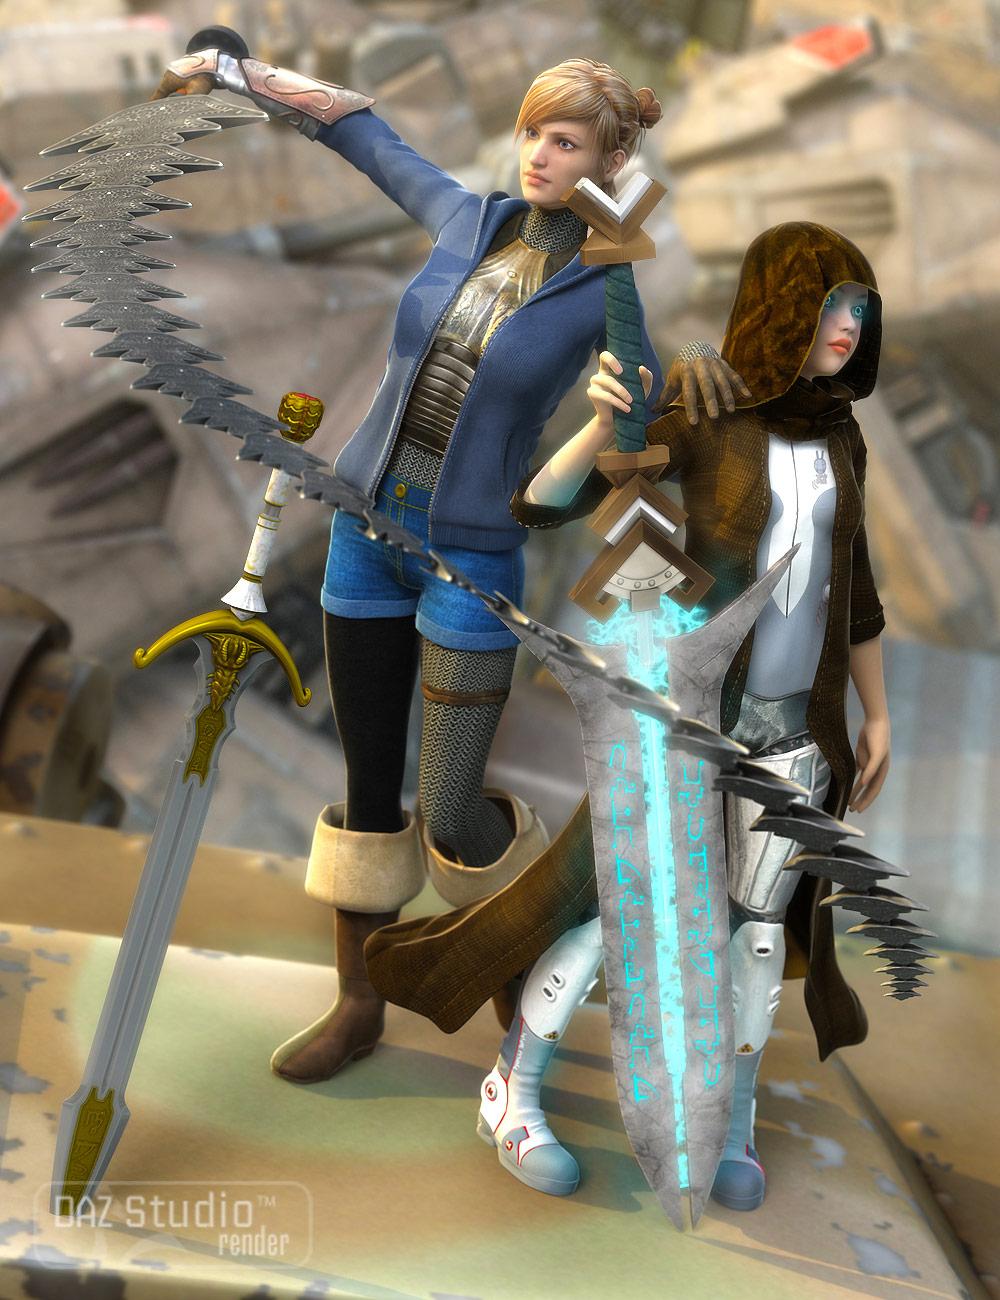 Swords Fantastic by: Valandar, 3D Models by Daz 3D